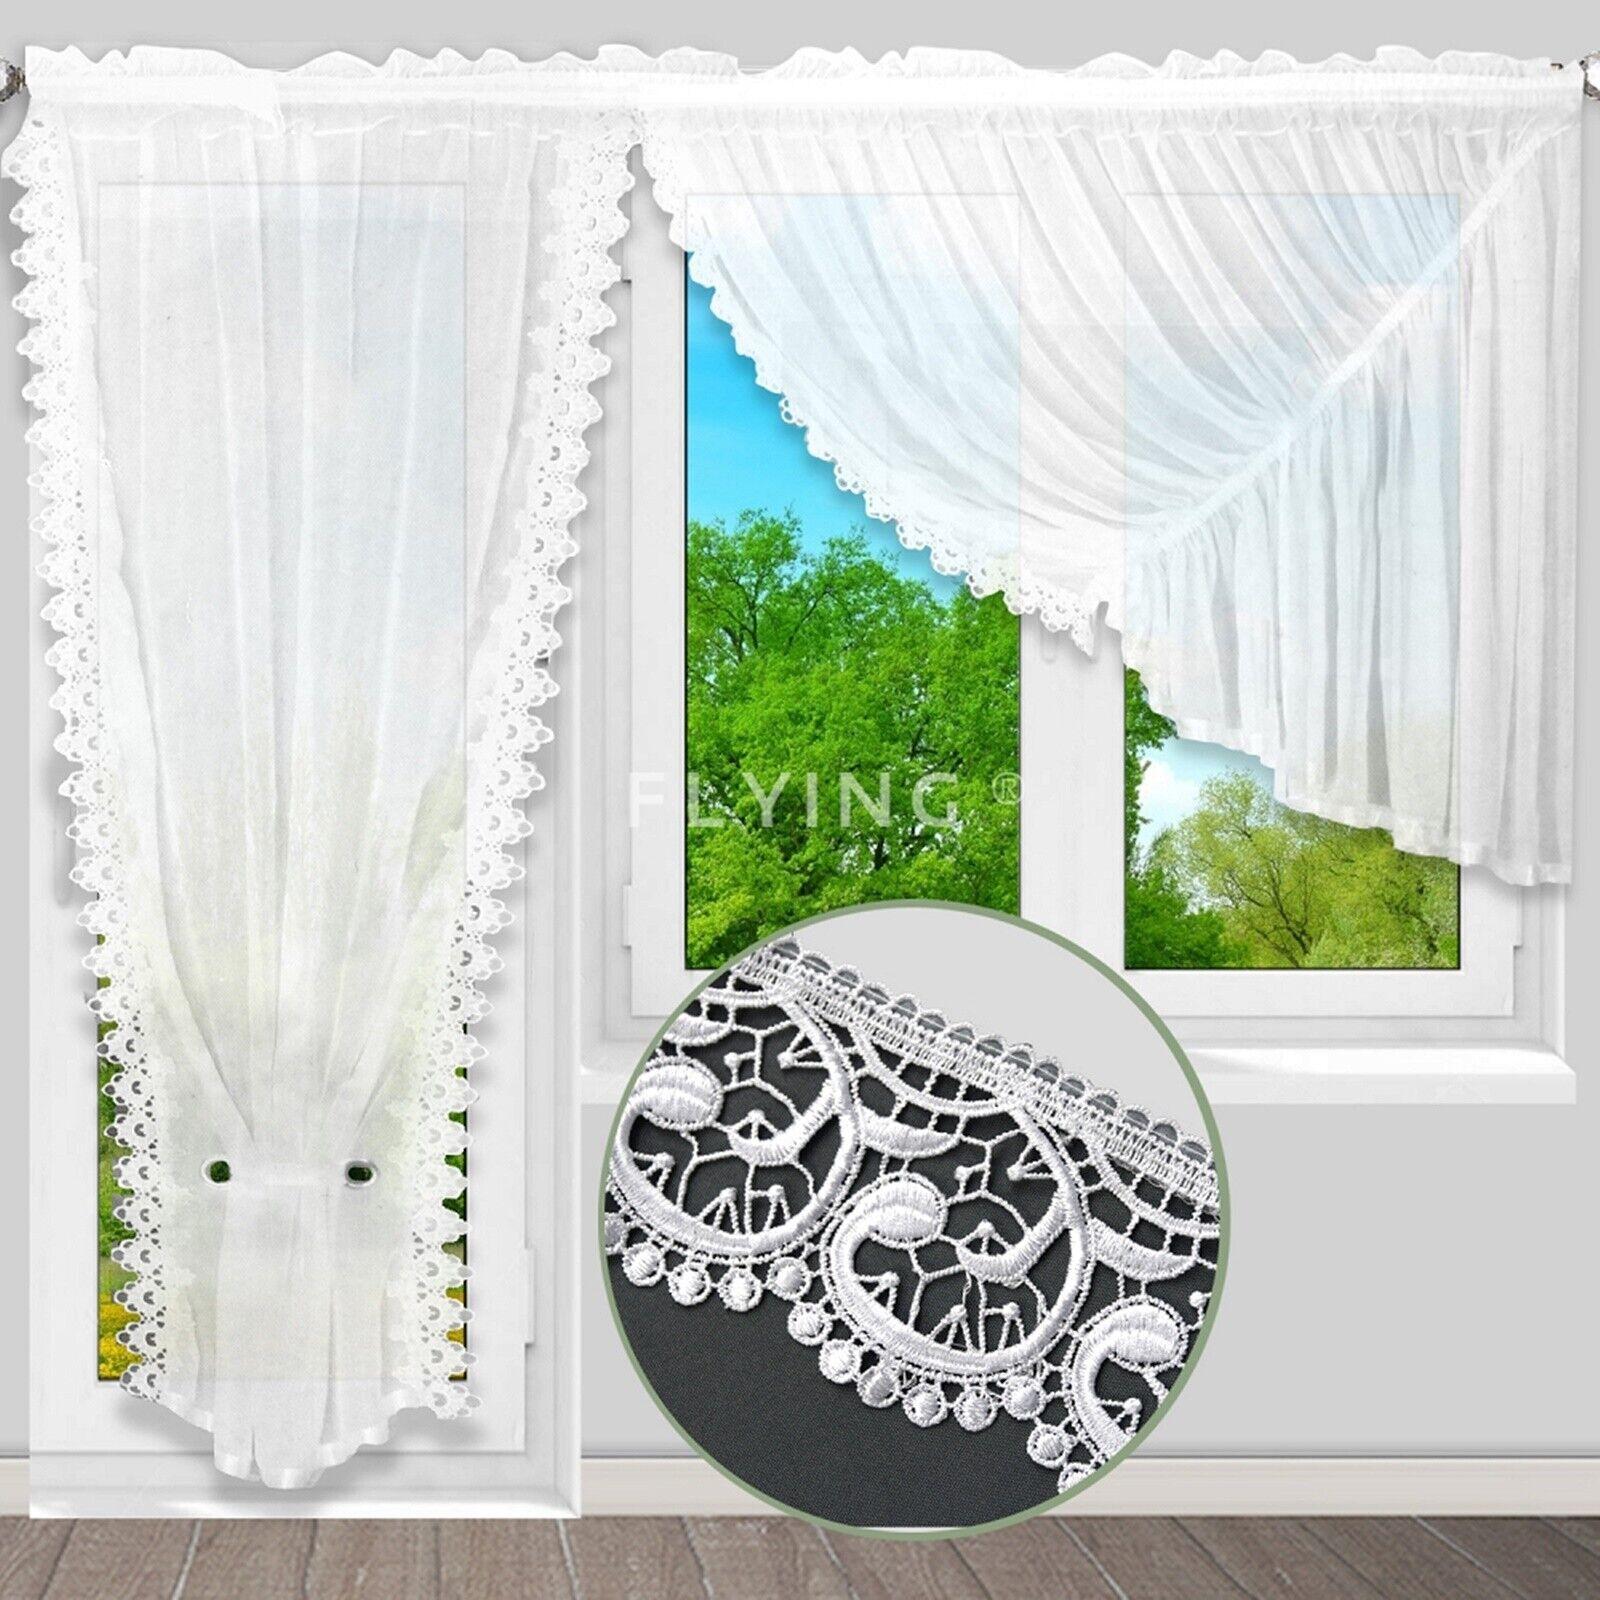 Balkon Balkontür Gardine 500/250 Store Gipüre Voile Fenstergardine Feriggardine